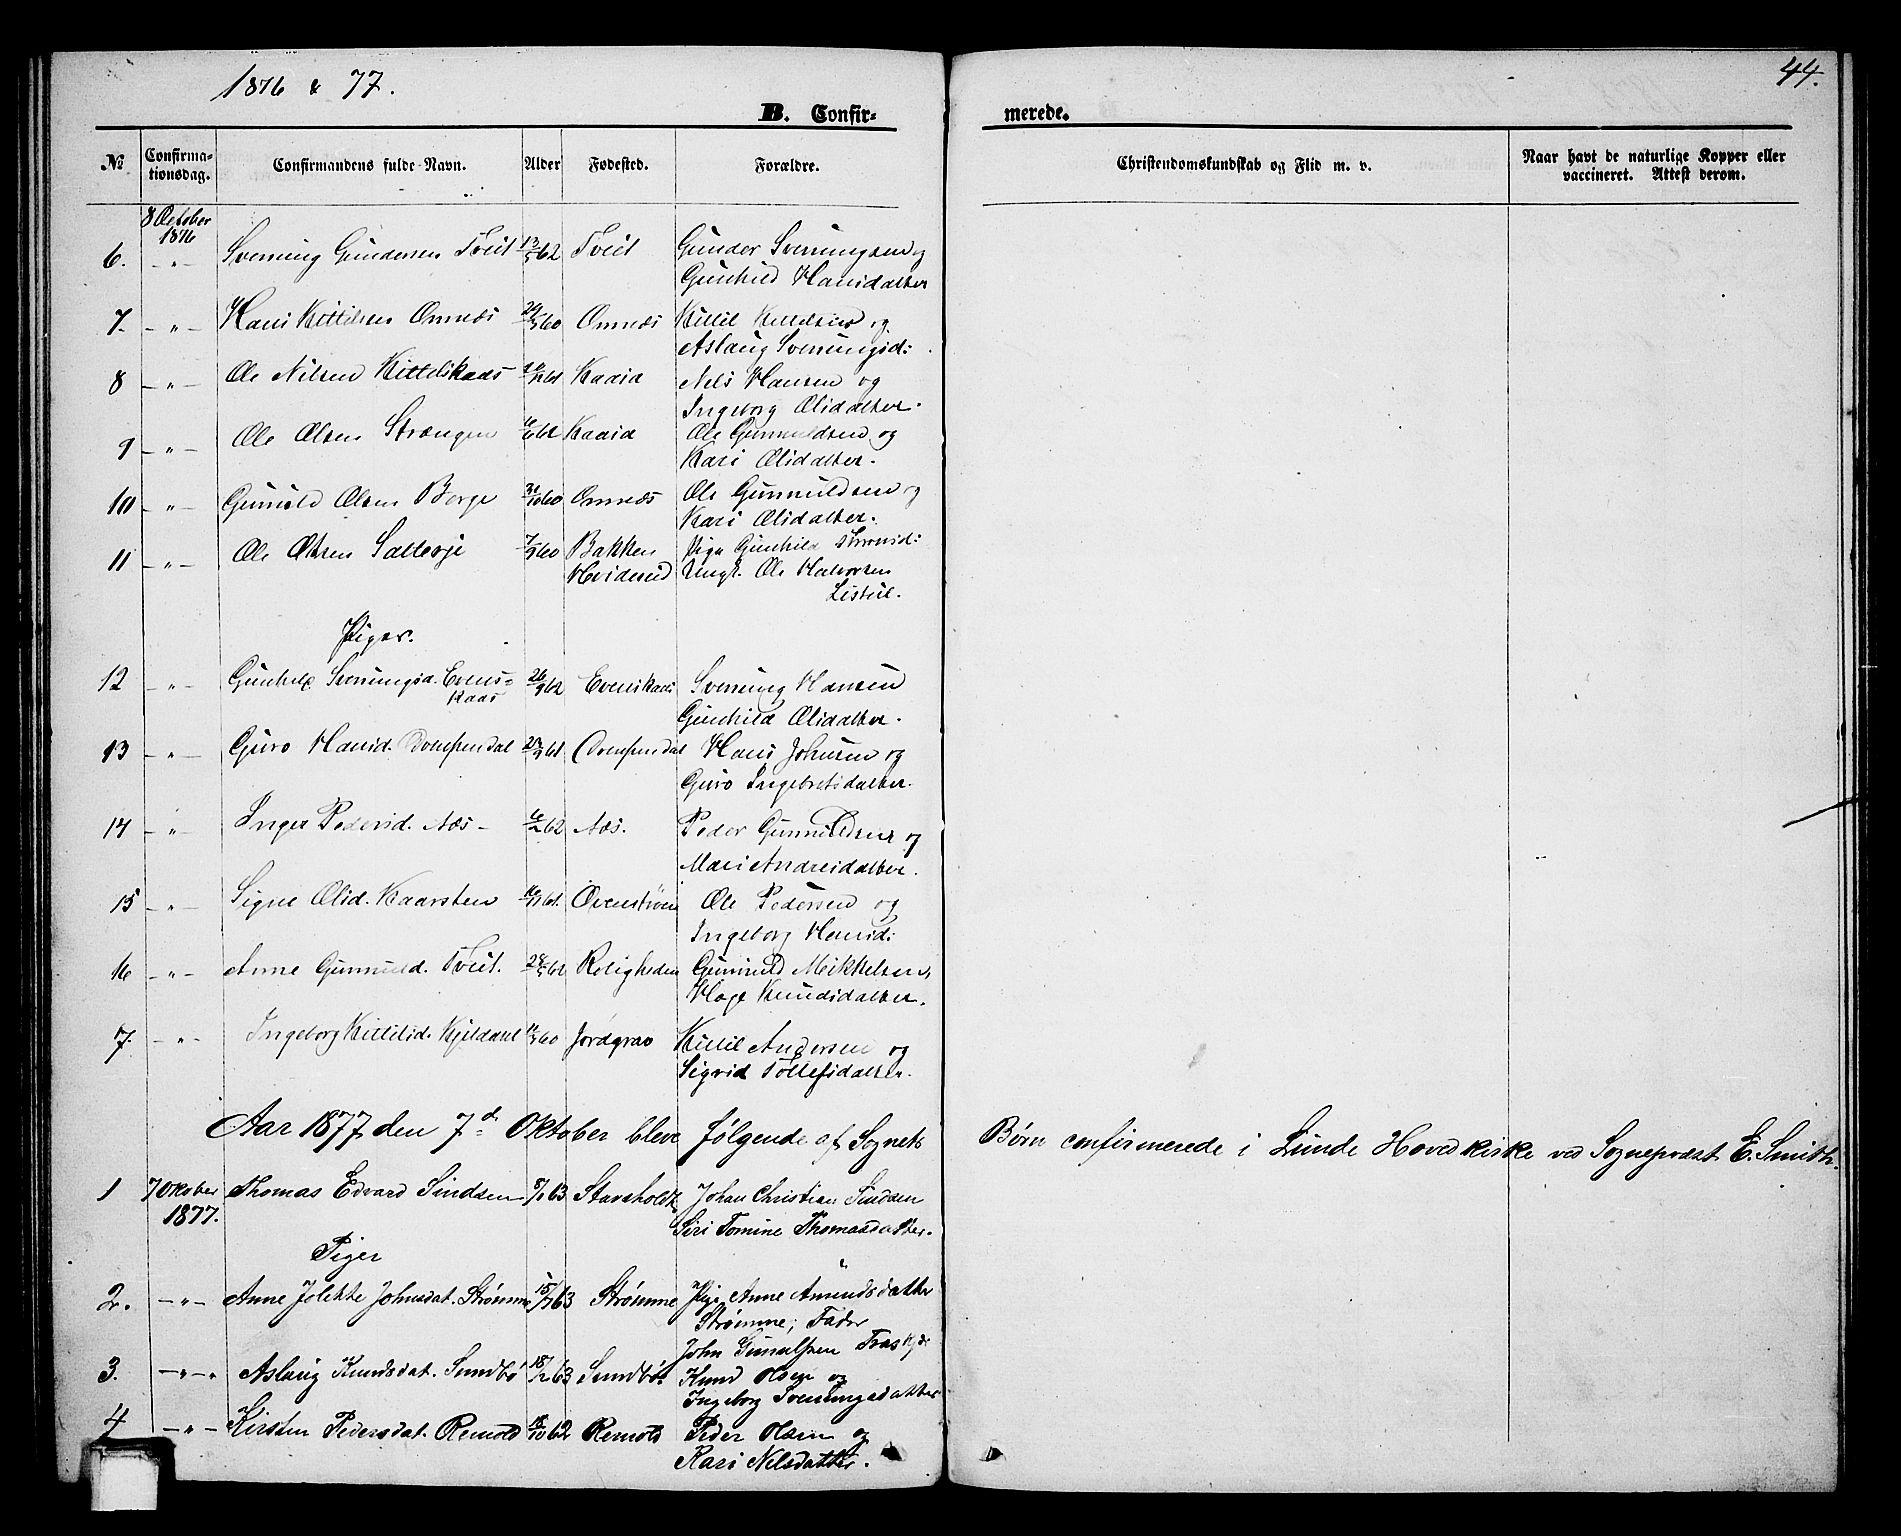 SAKO, Lunde kirkebøker, G/Gb/L0001: Klokkerbok nr. II 1, 1866-1887, s. 44